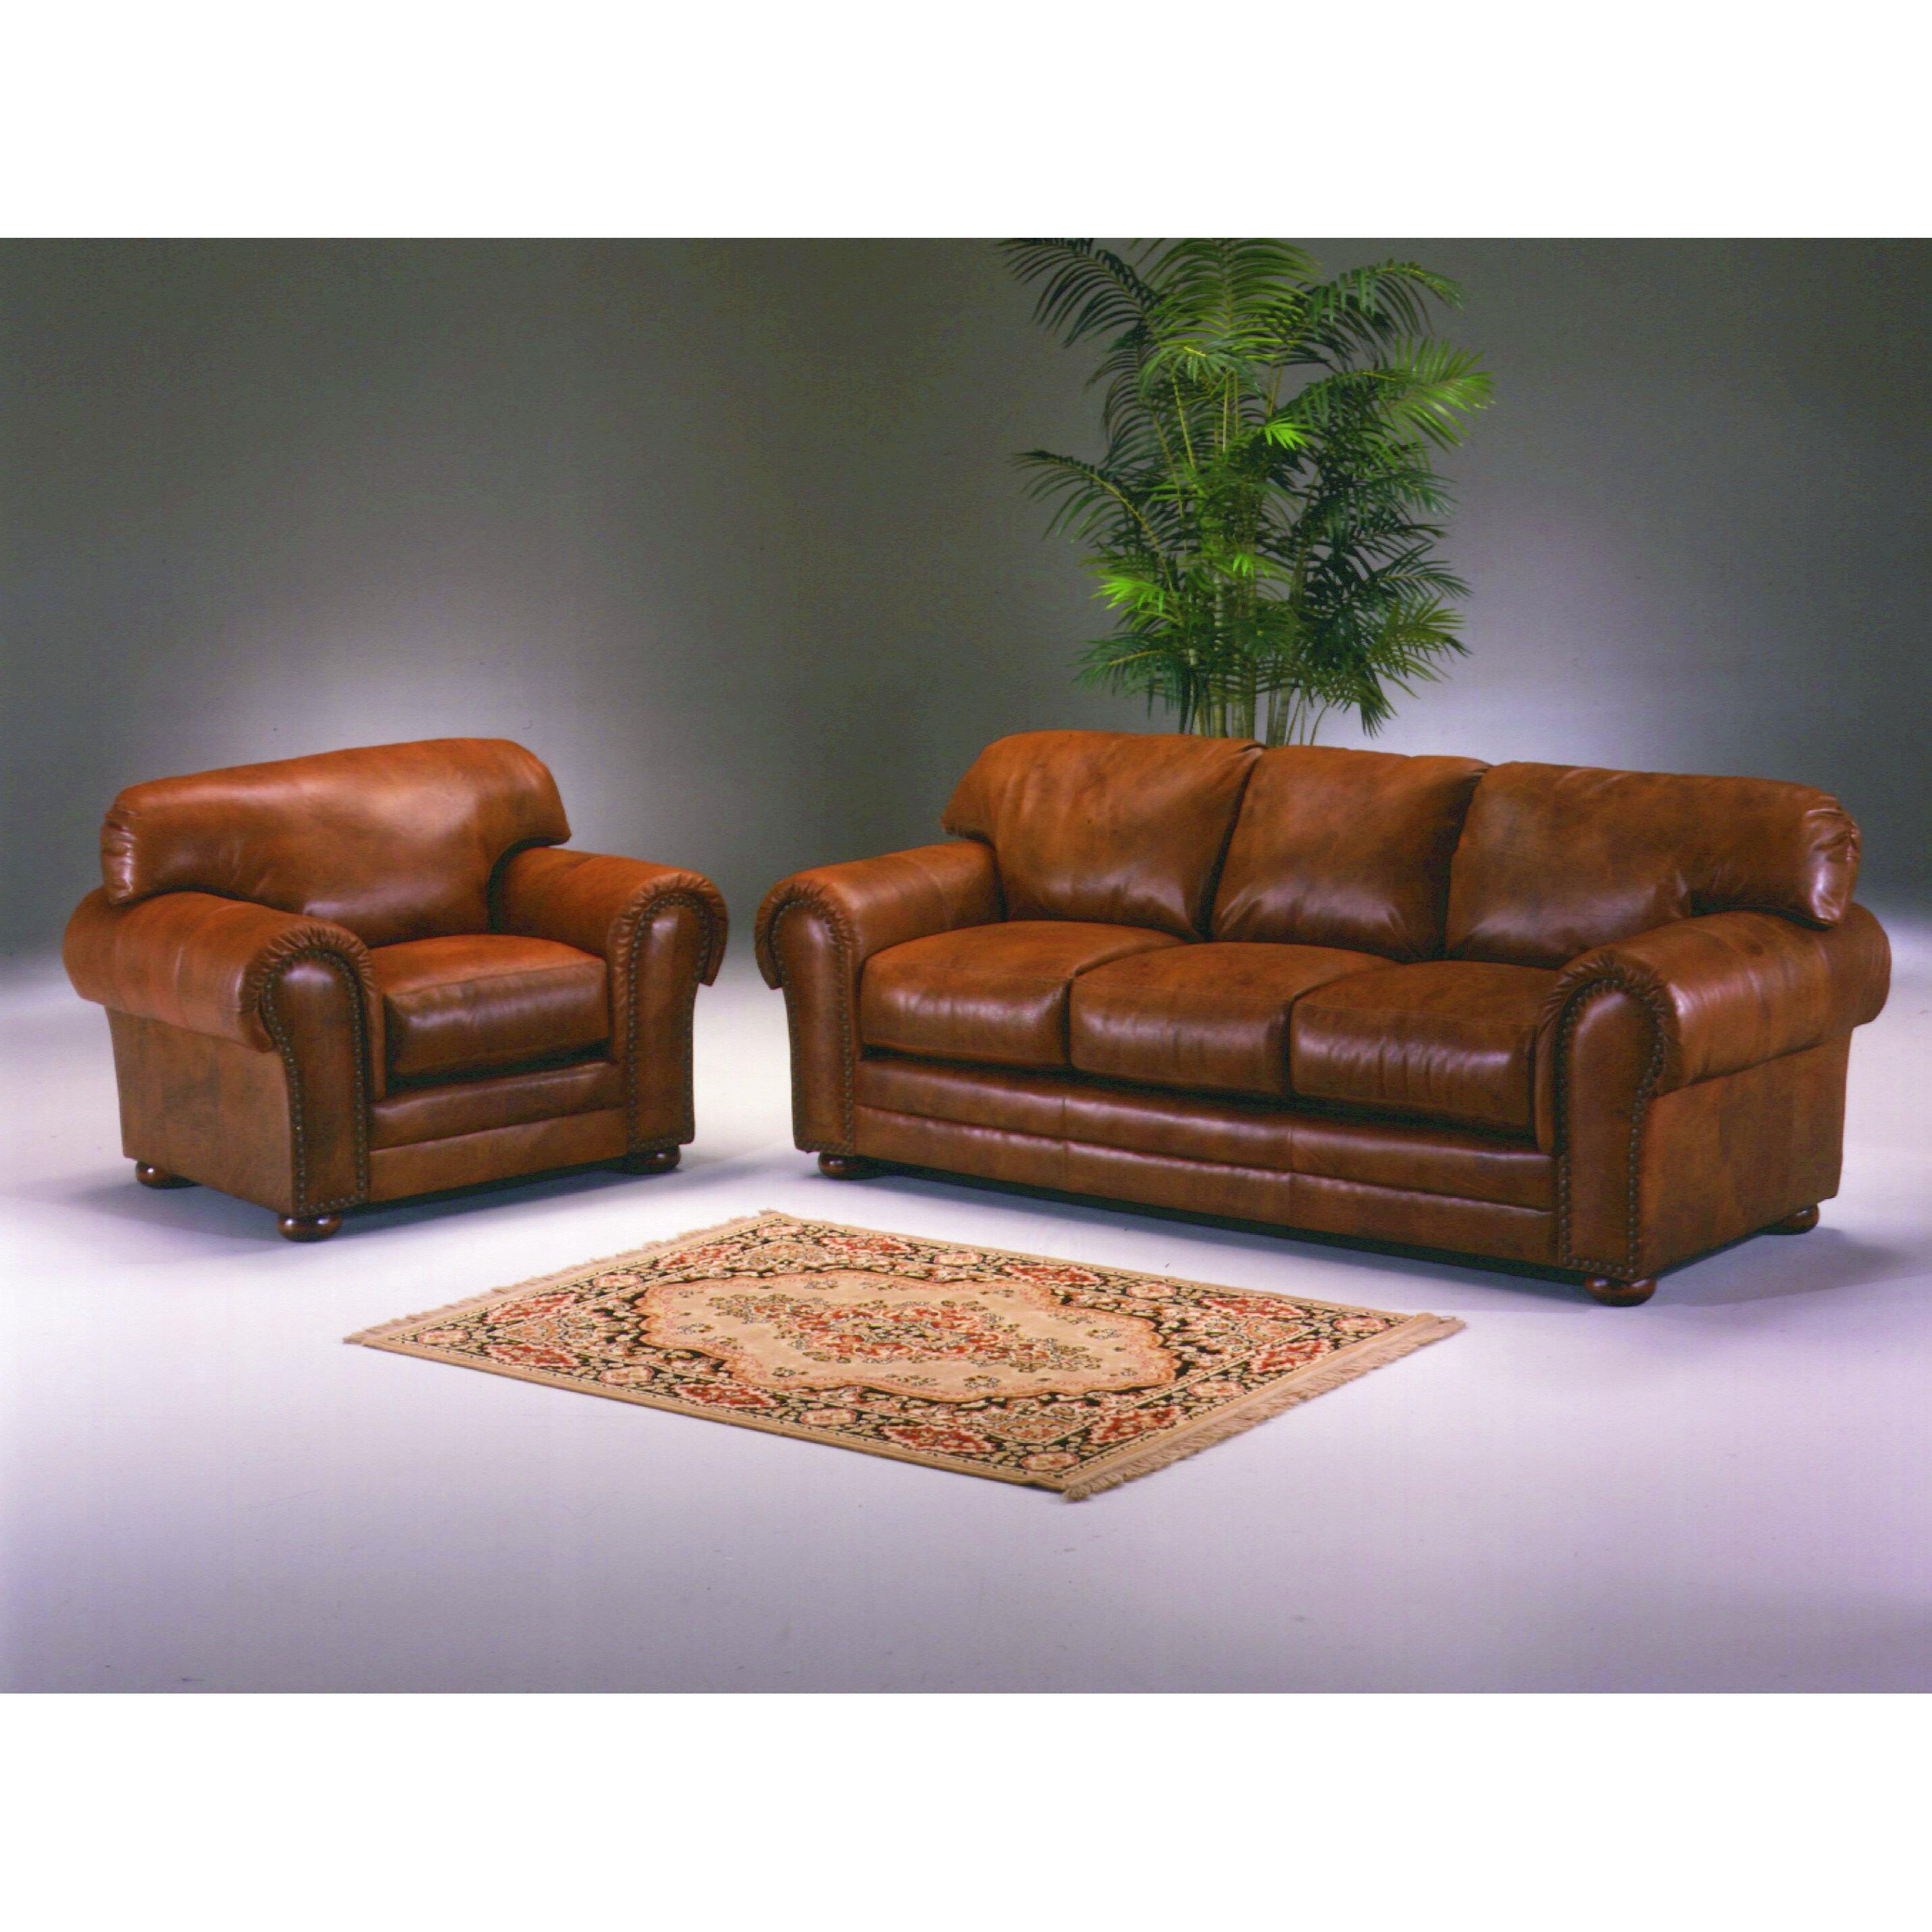 Omnia Leather Cheyenne 3 Seat Leather Sofa Set Reviews